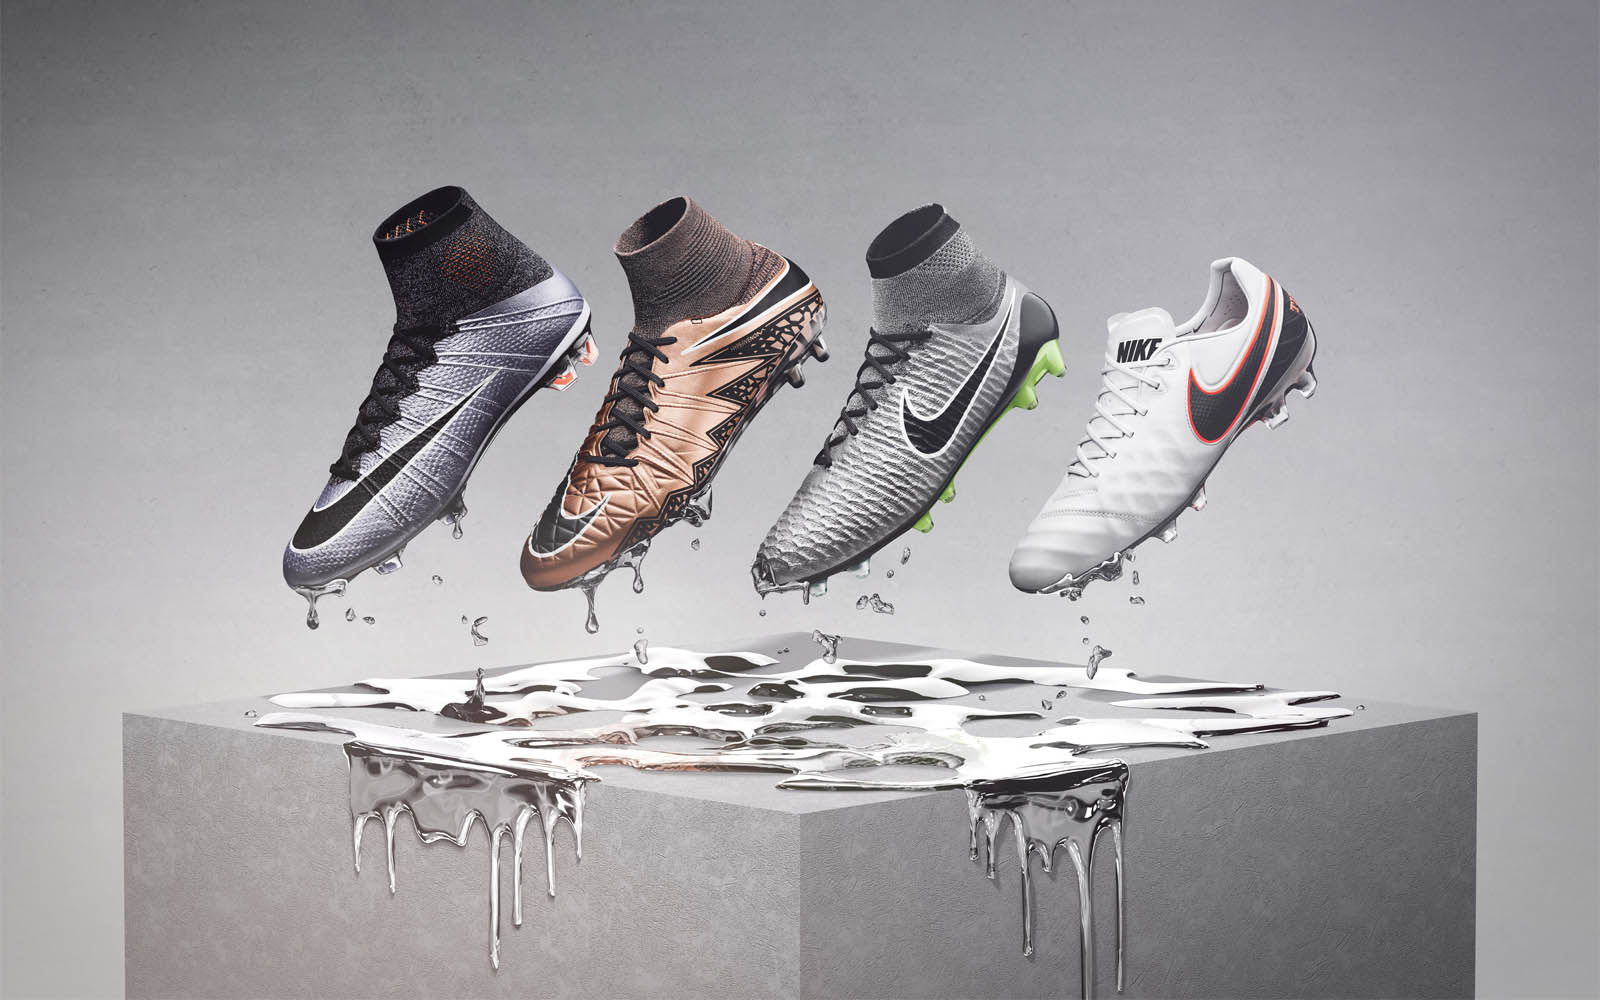 new nike football boots 2015 nike high top soccer cheap